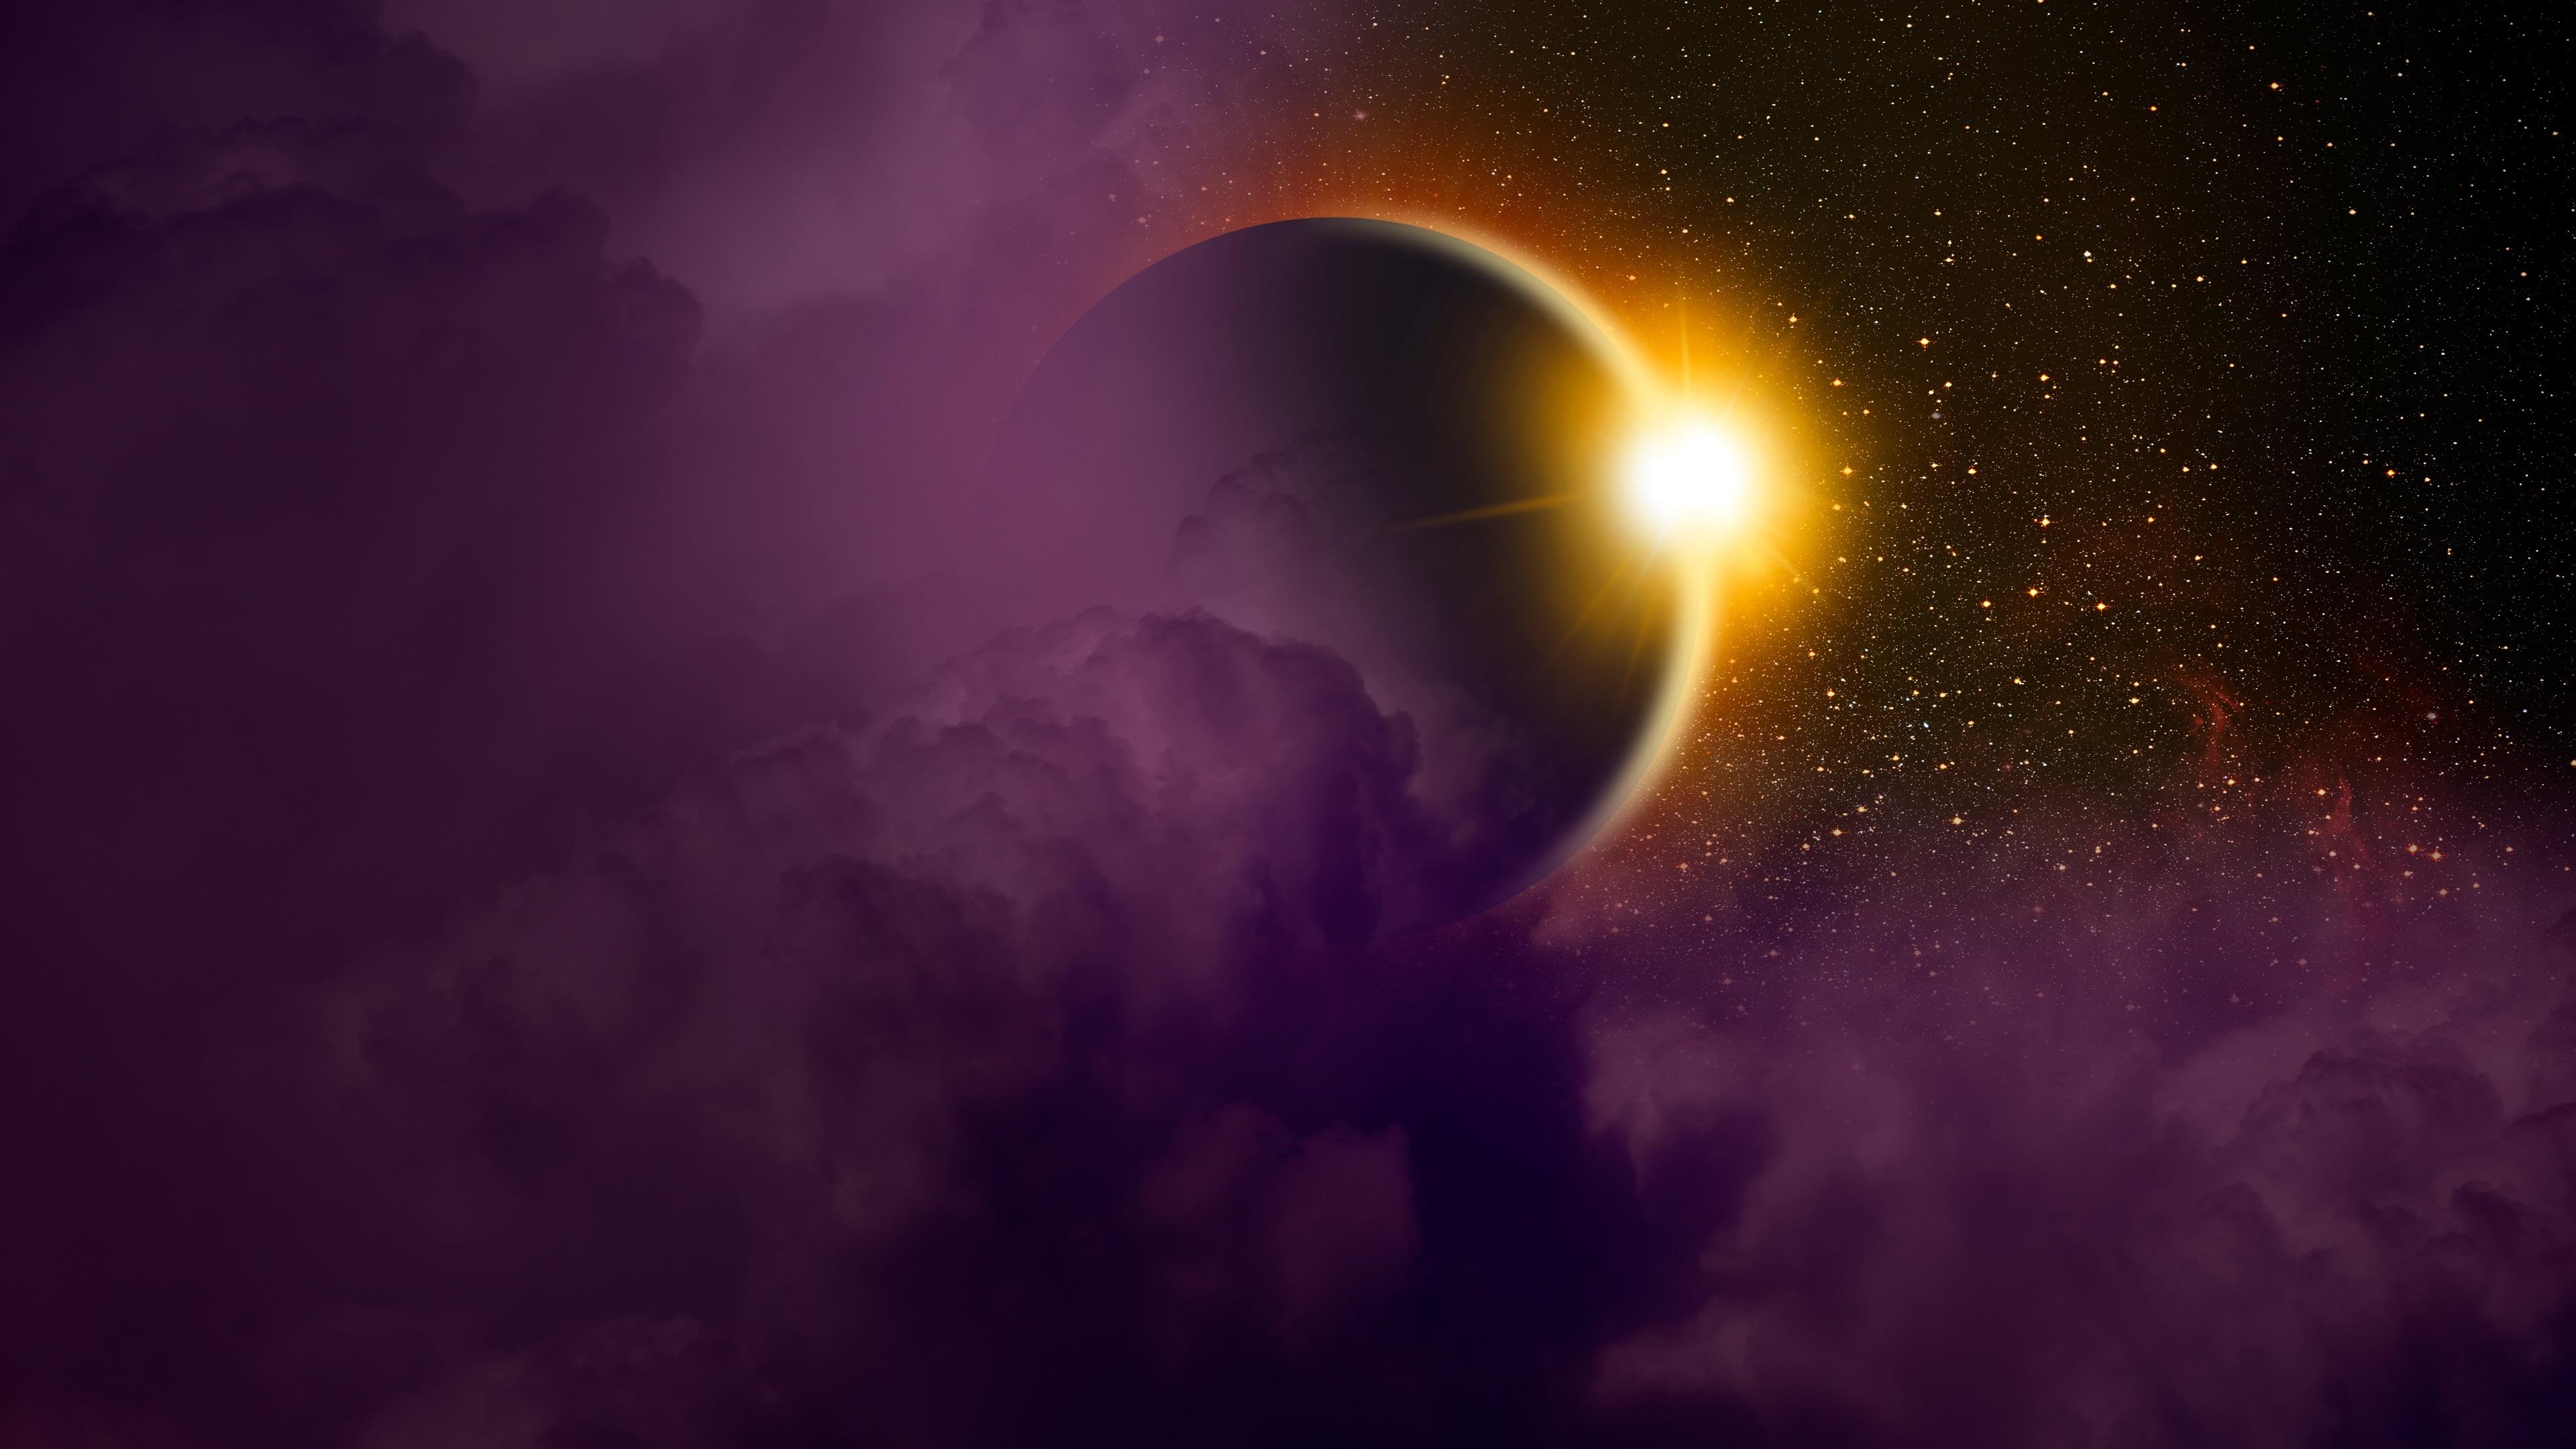 Wallpaper Solar Eclipse Planet Light Space 3840x2160 Uhd 4k